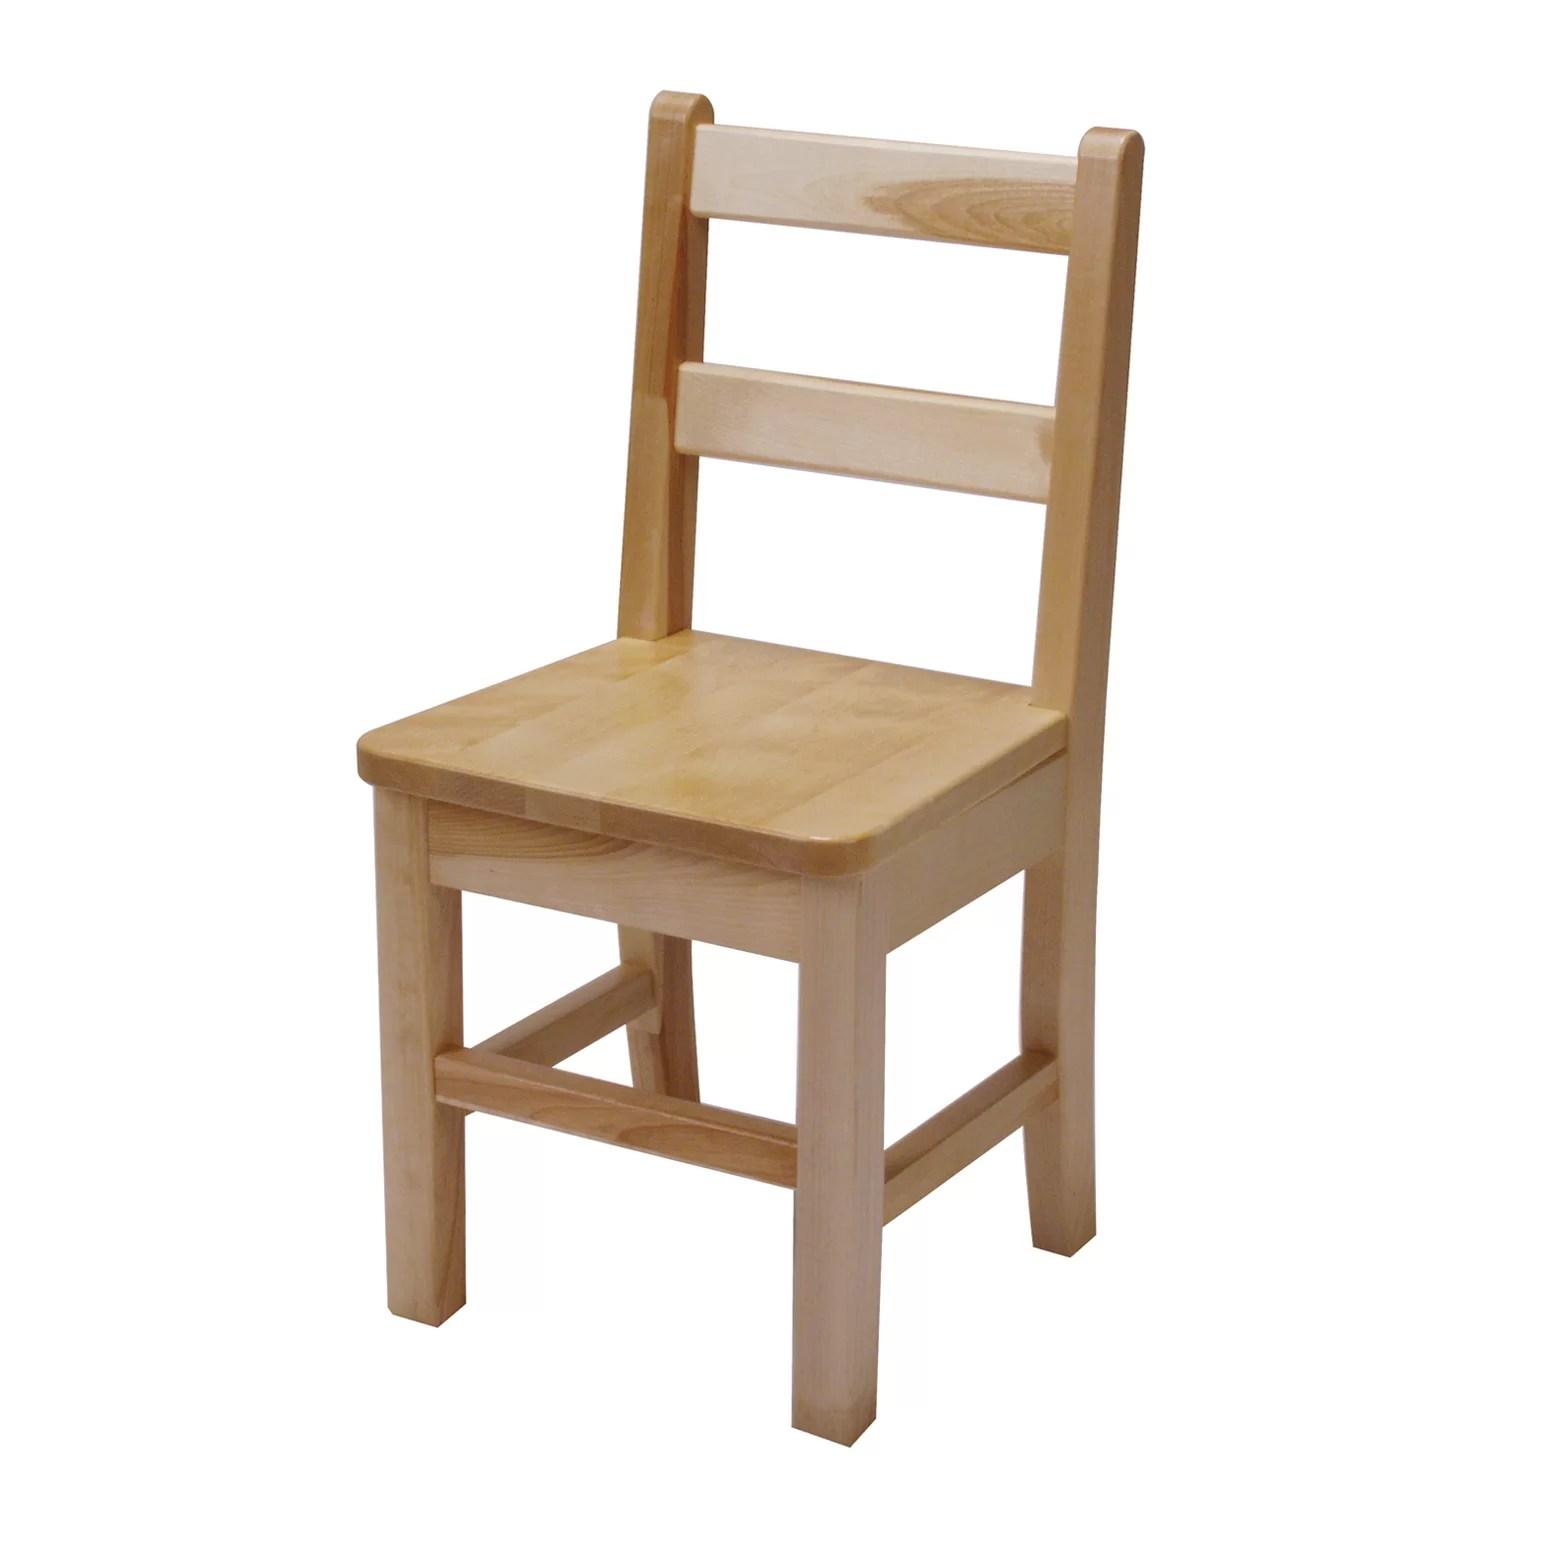 office chair johor swivel patrol j b poitras 16 quot wood classroom and reviews wayfair